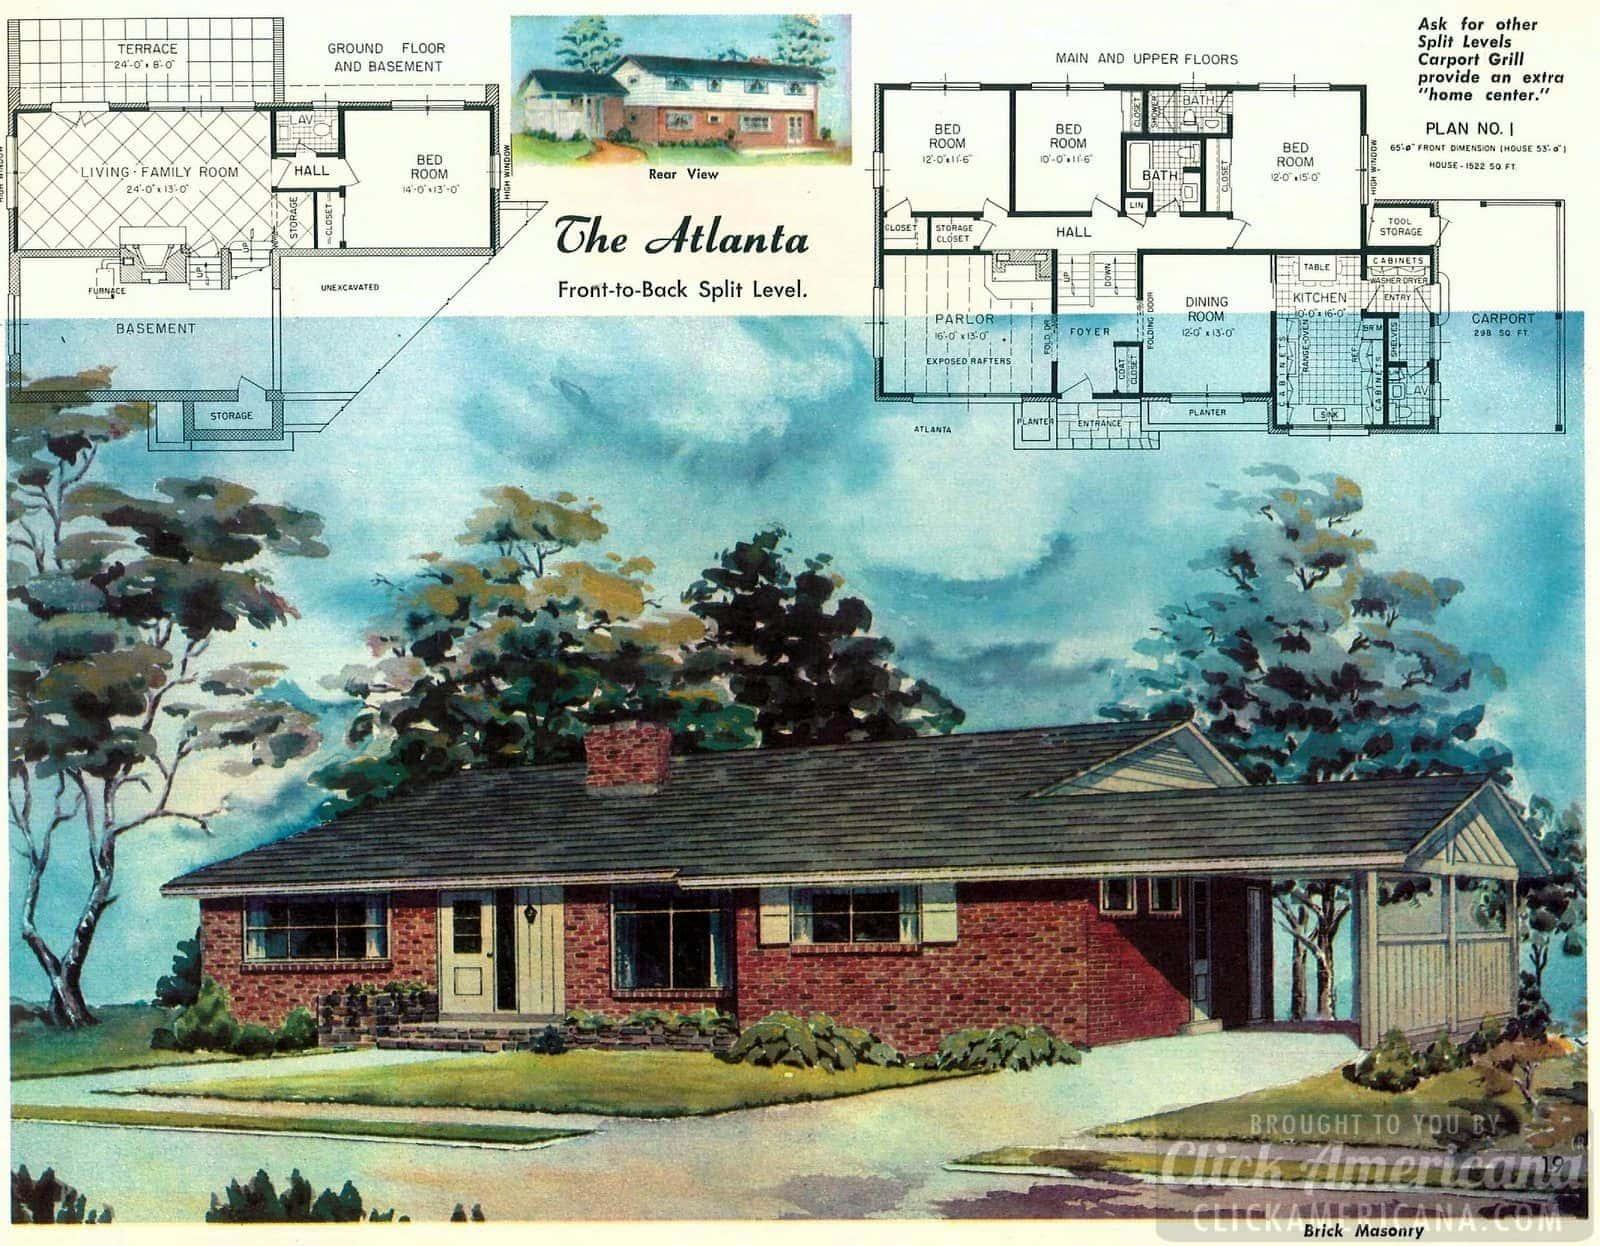 The Atlanta split-level: Home plans from 1958